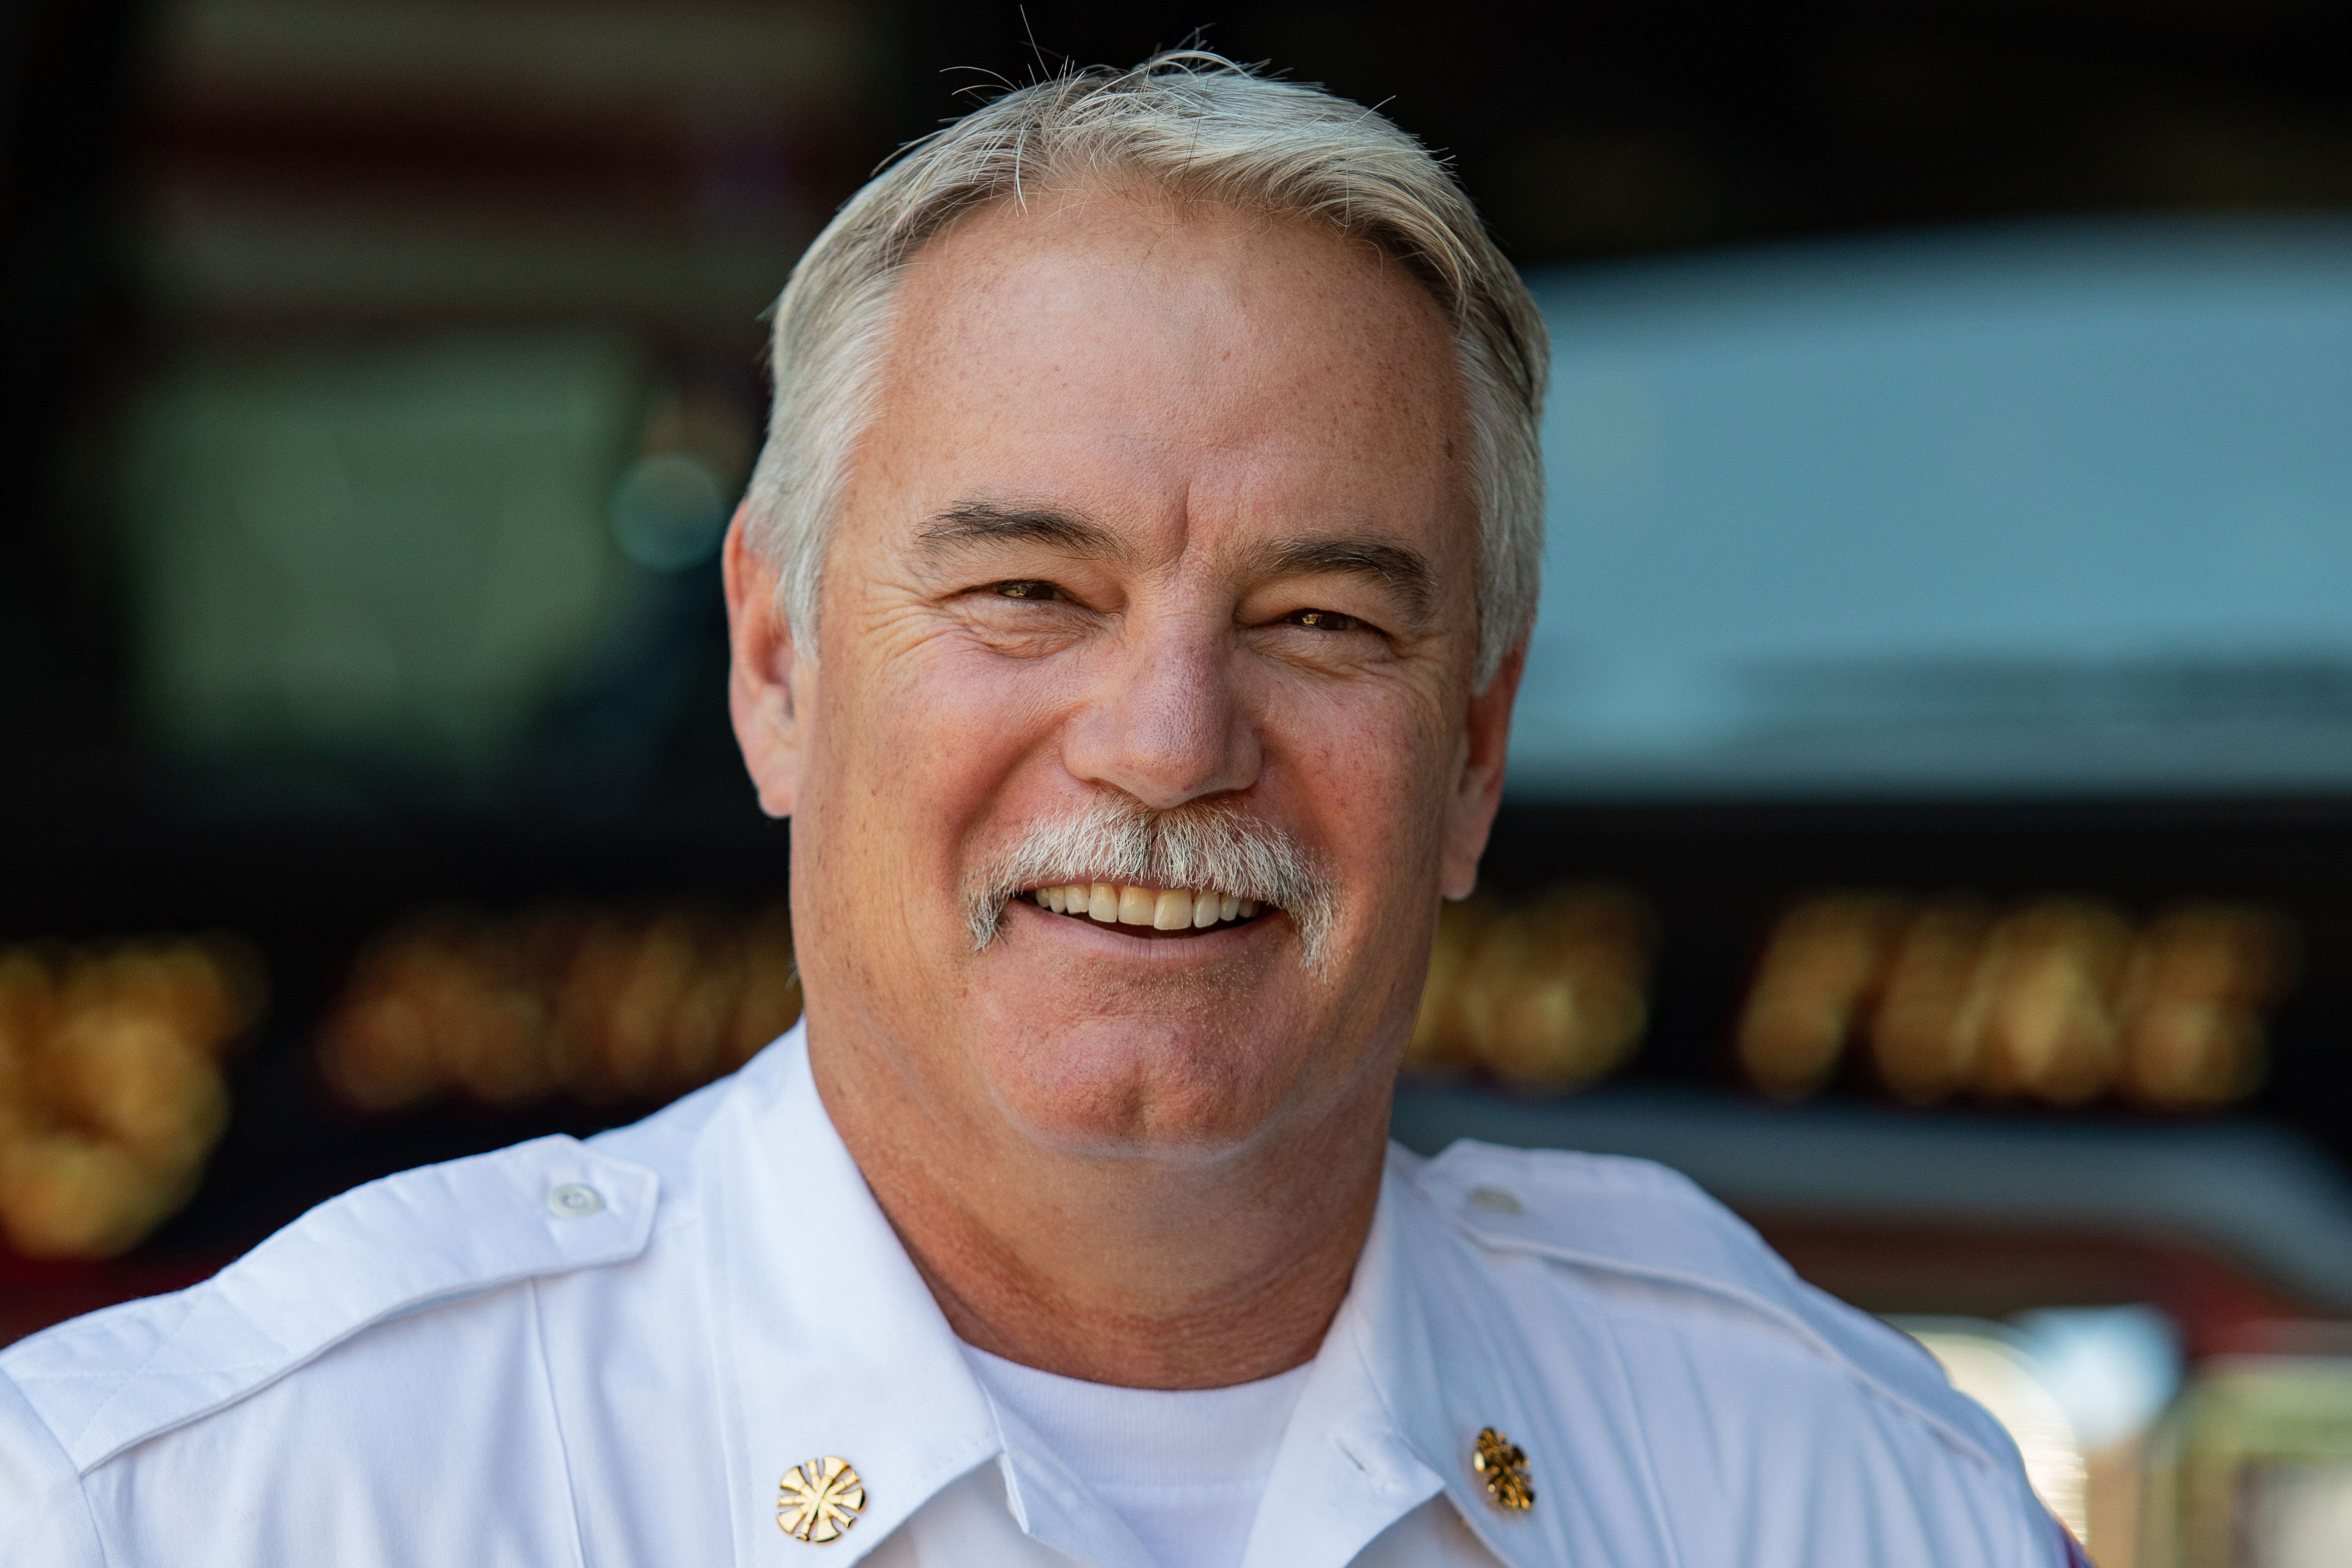 Schaumburg Fire Department - Chief James Walters